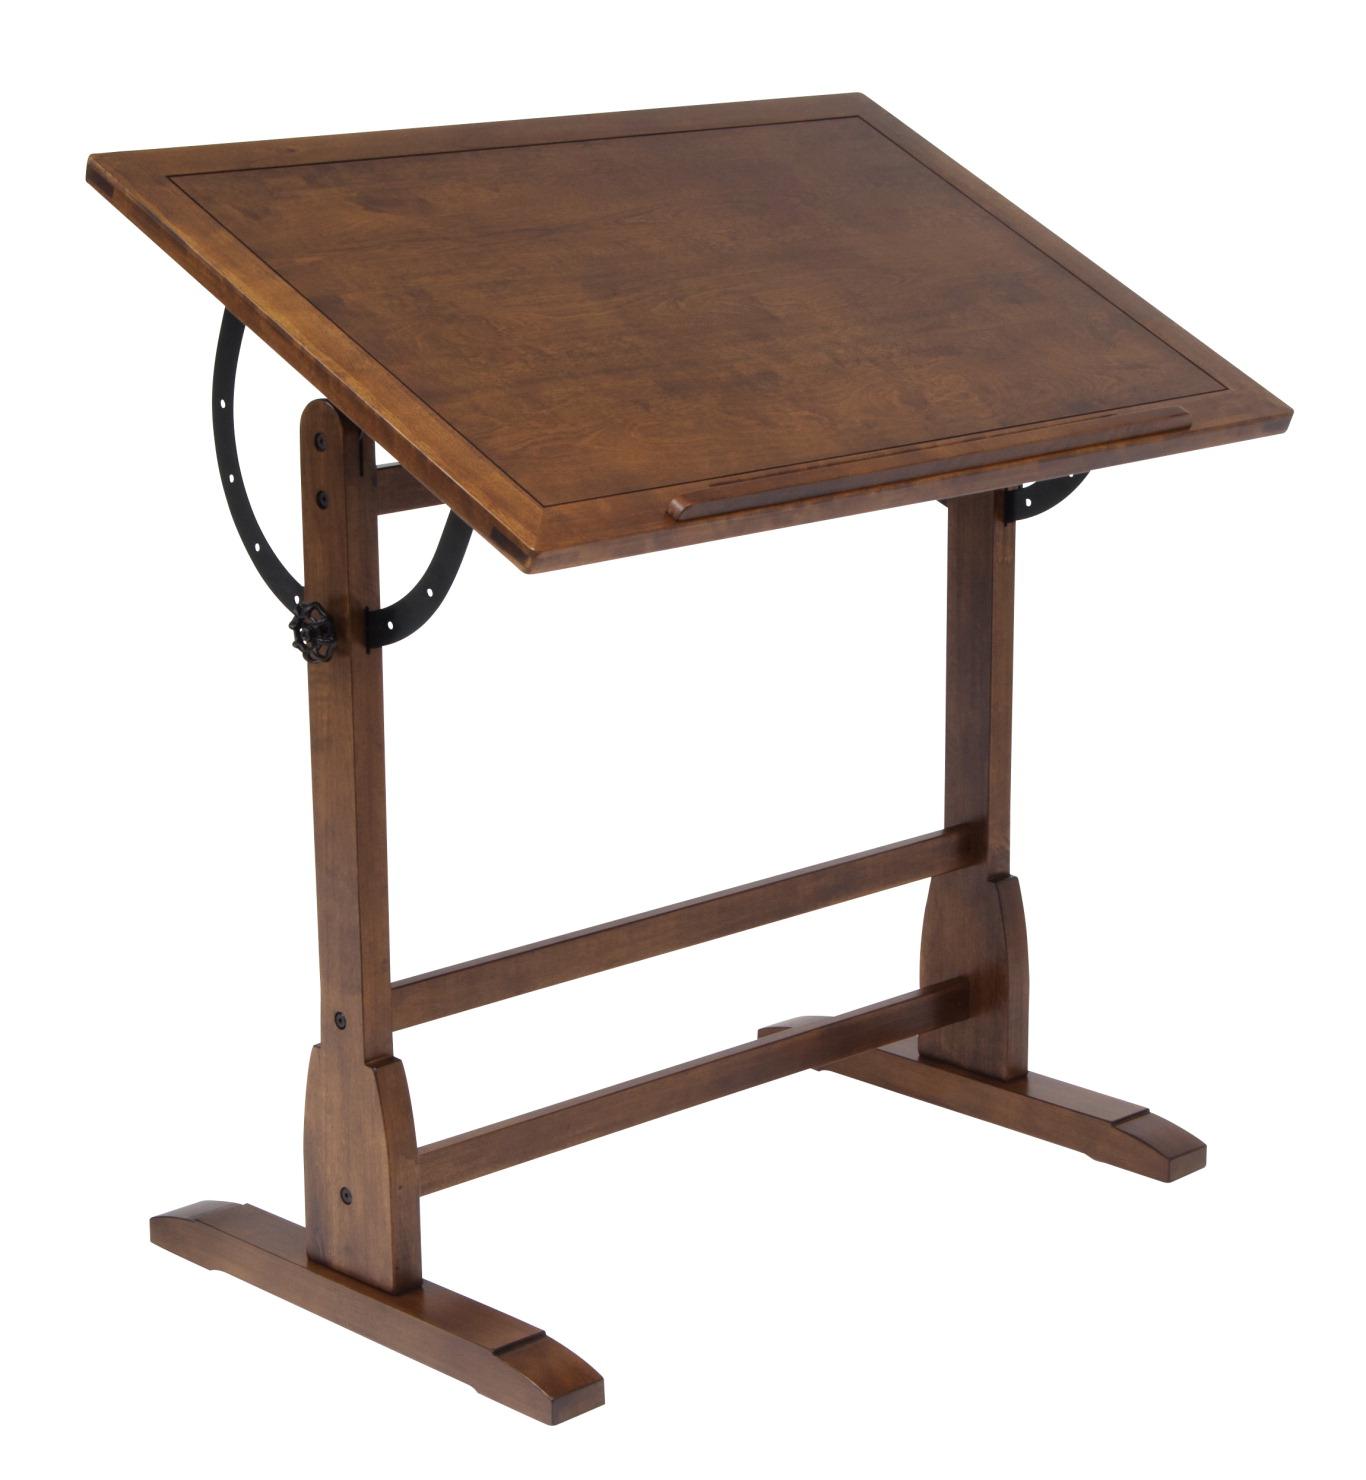 Studio Designs Vintage Clic Design Drafting Table 36 In W X 24 D 34